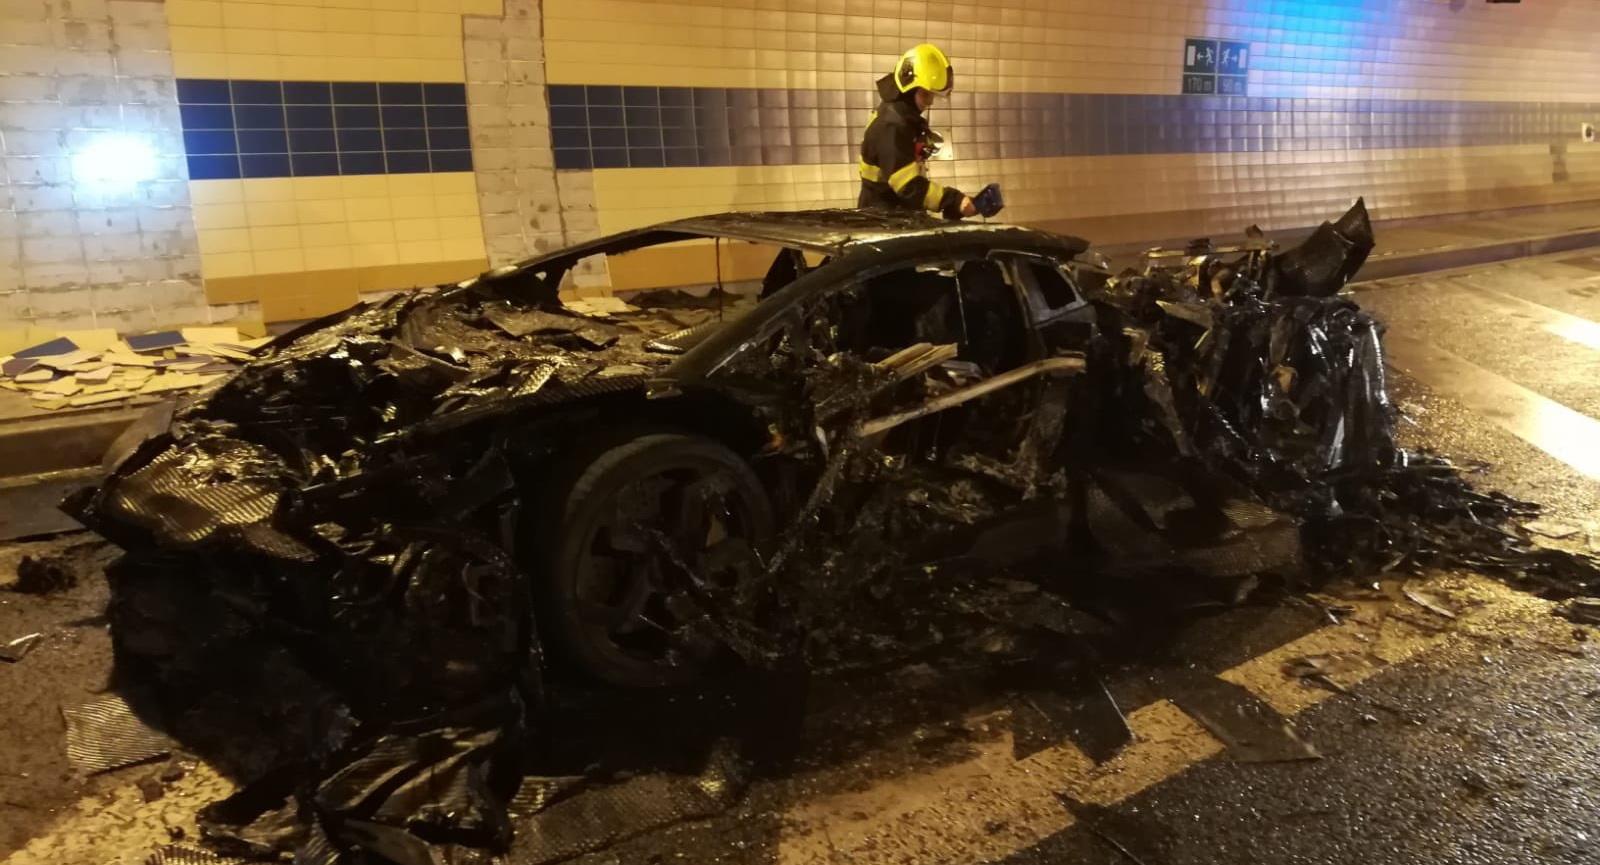 Lamborghini-Aventador-Carbonado-burned-1